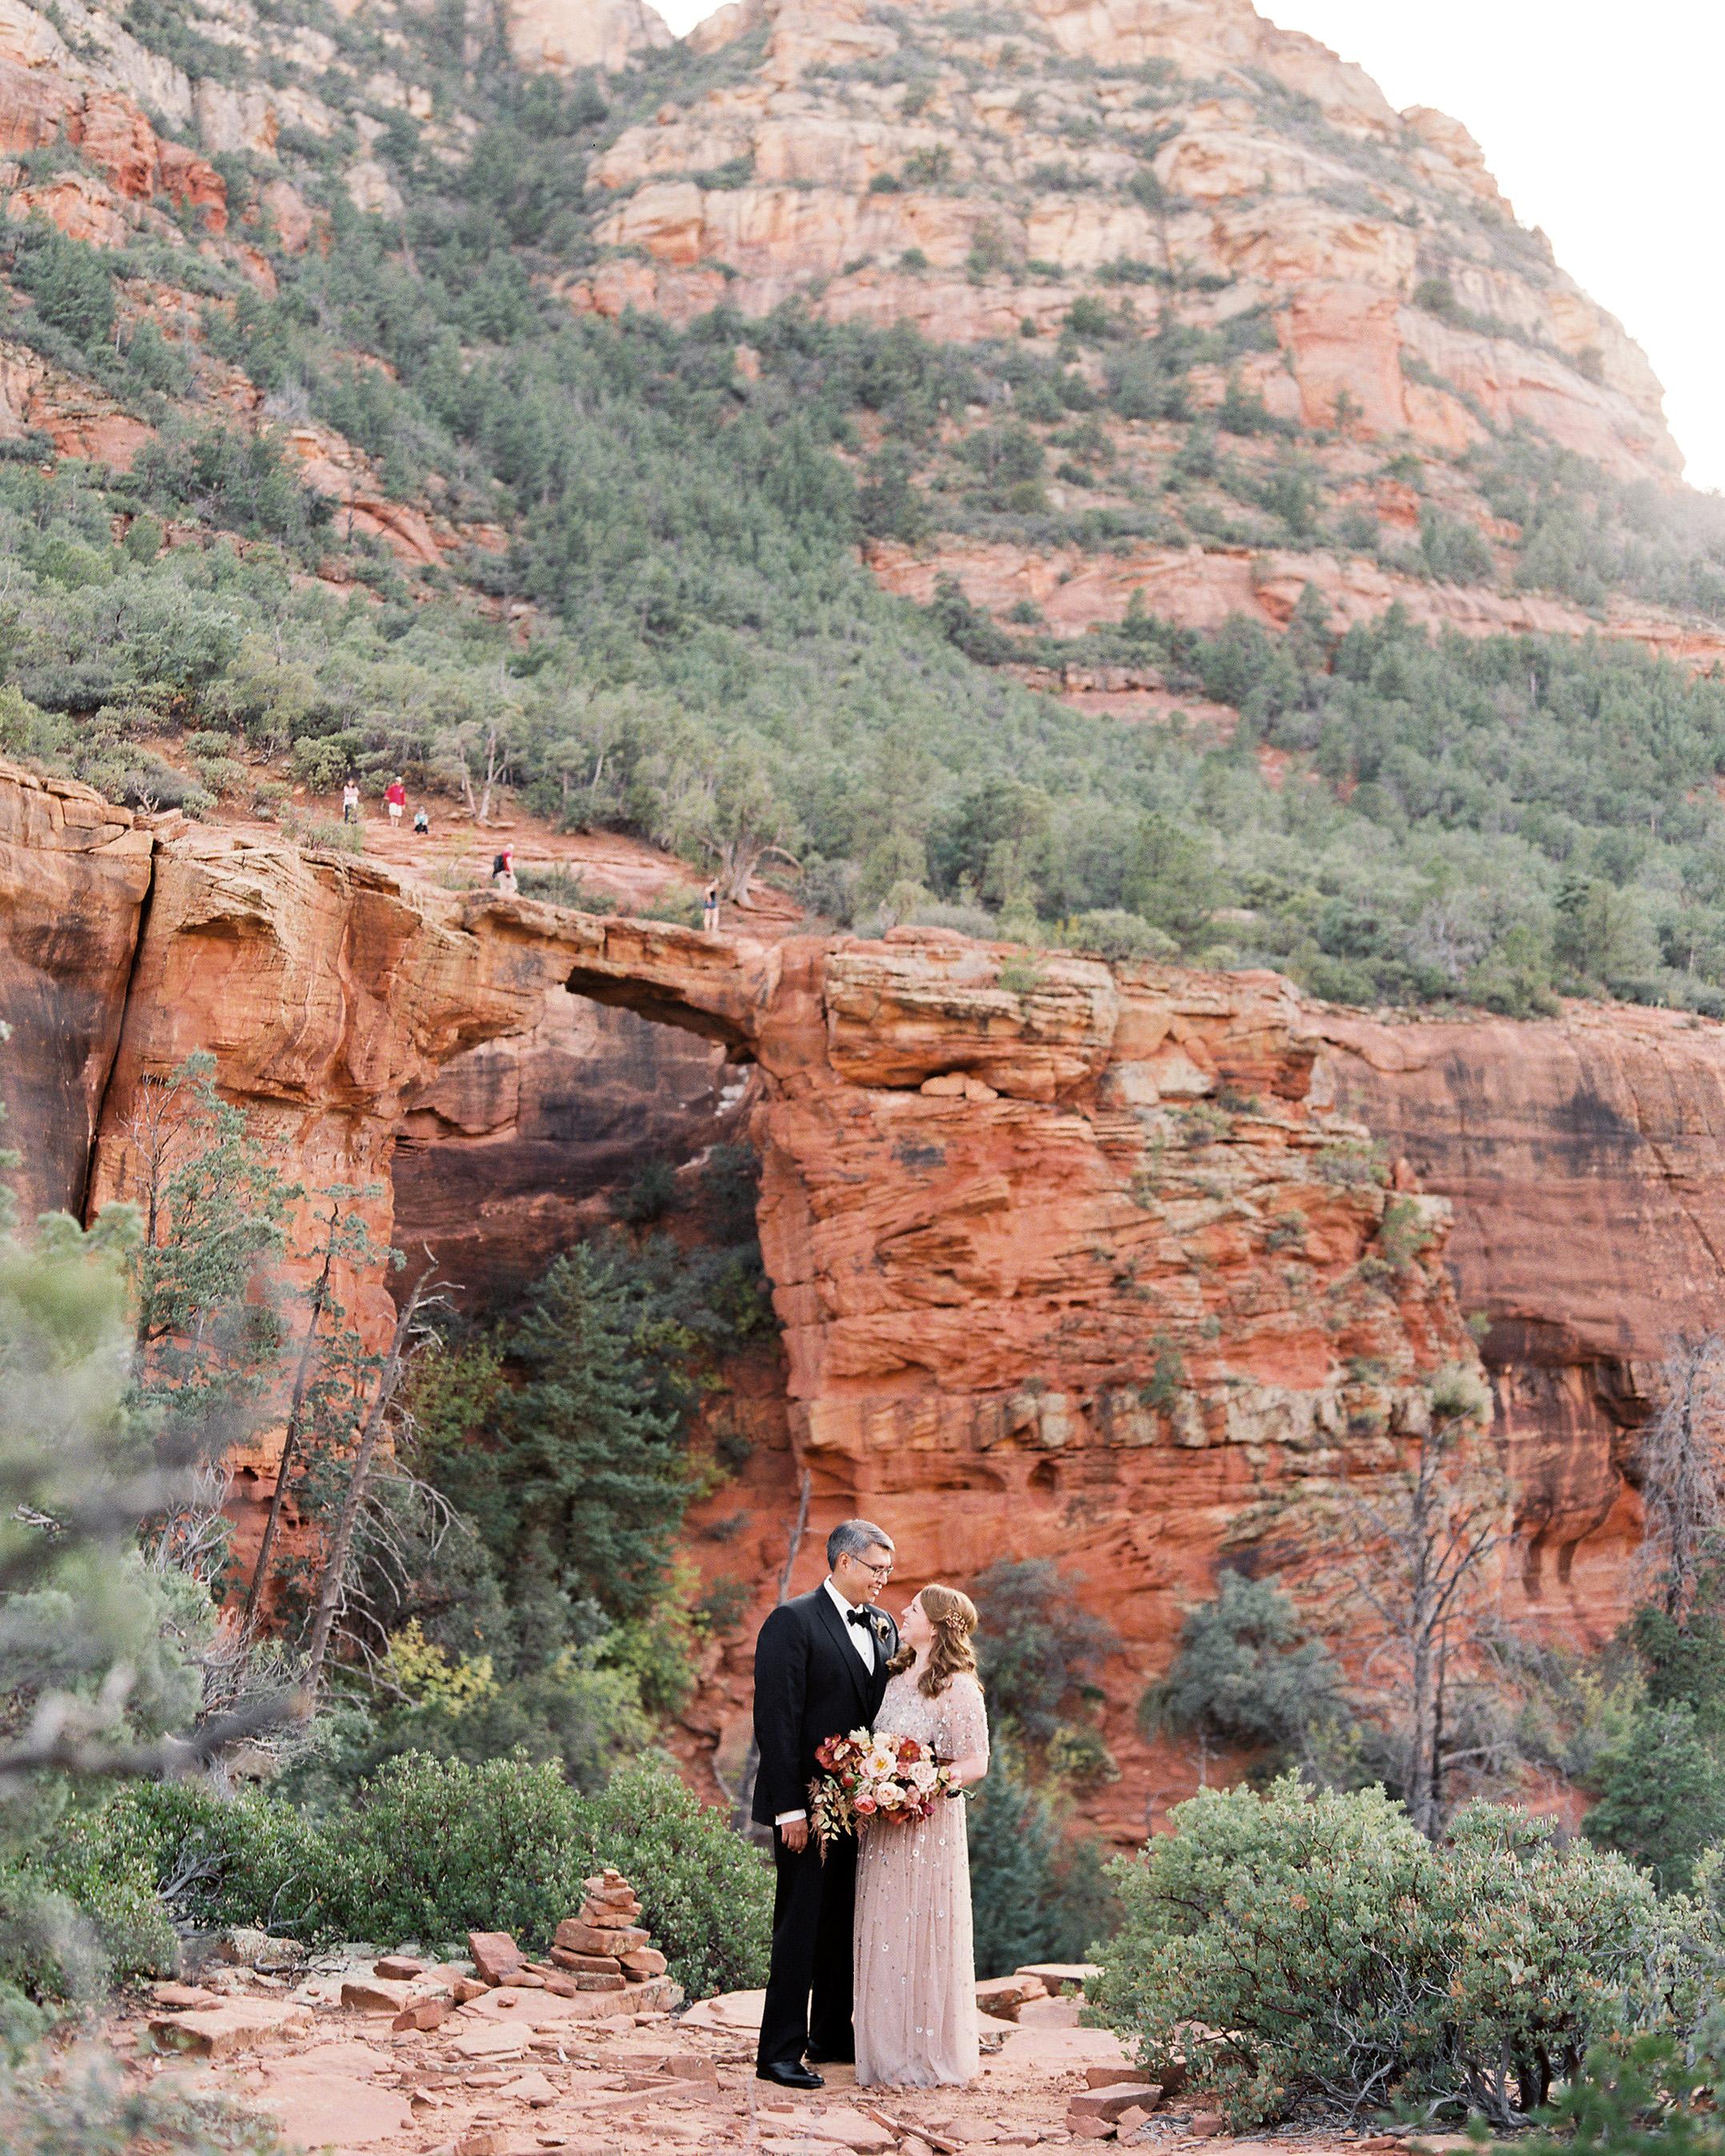 stefanie terrel wedding couple red rocks